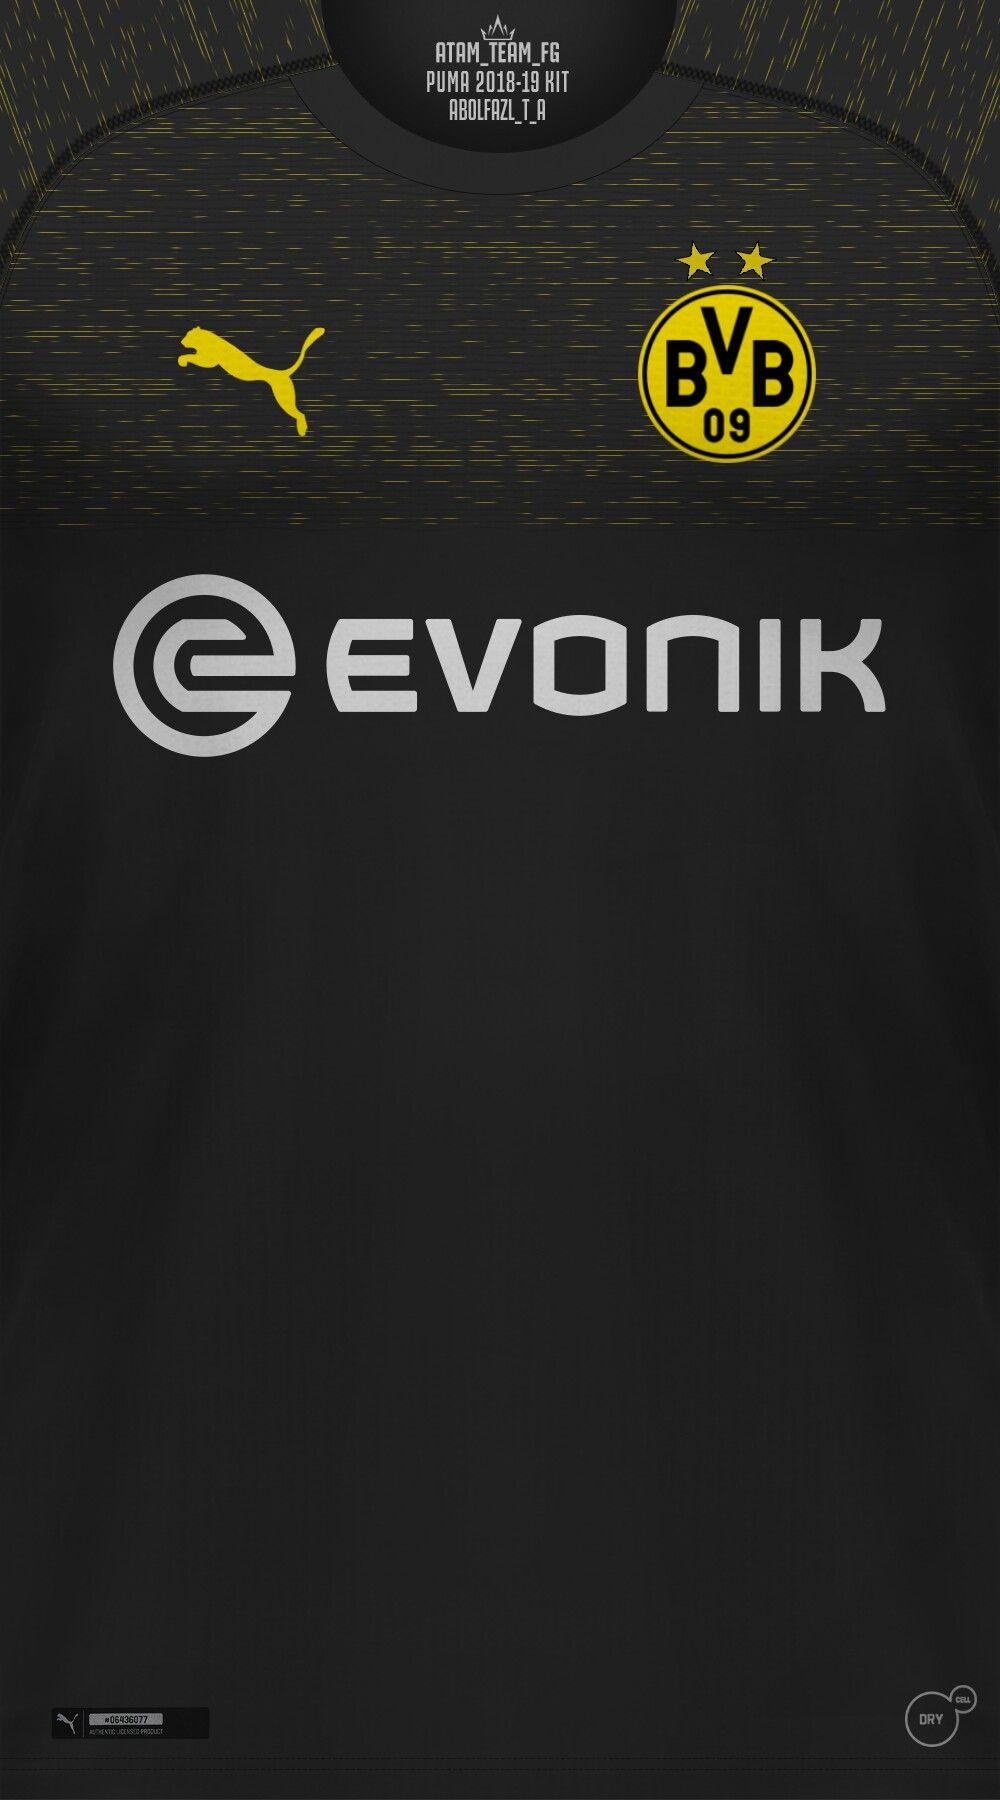 Pin Oleh Jannah Store Di Bola Suit Sepak Bola Olahraga Pertahanan